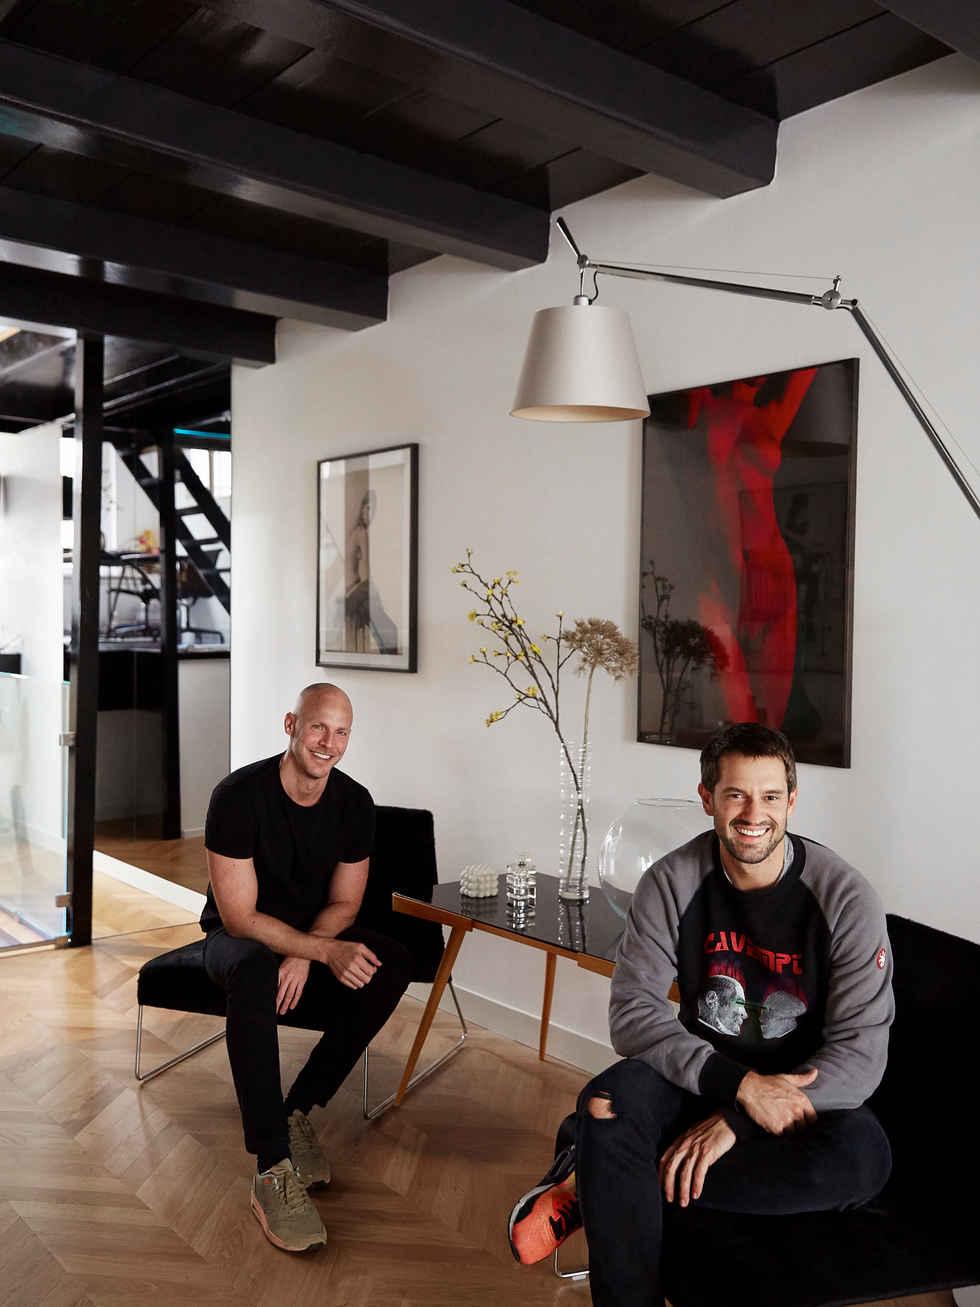 Philippe Vogelenzang & Rein Soons